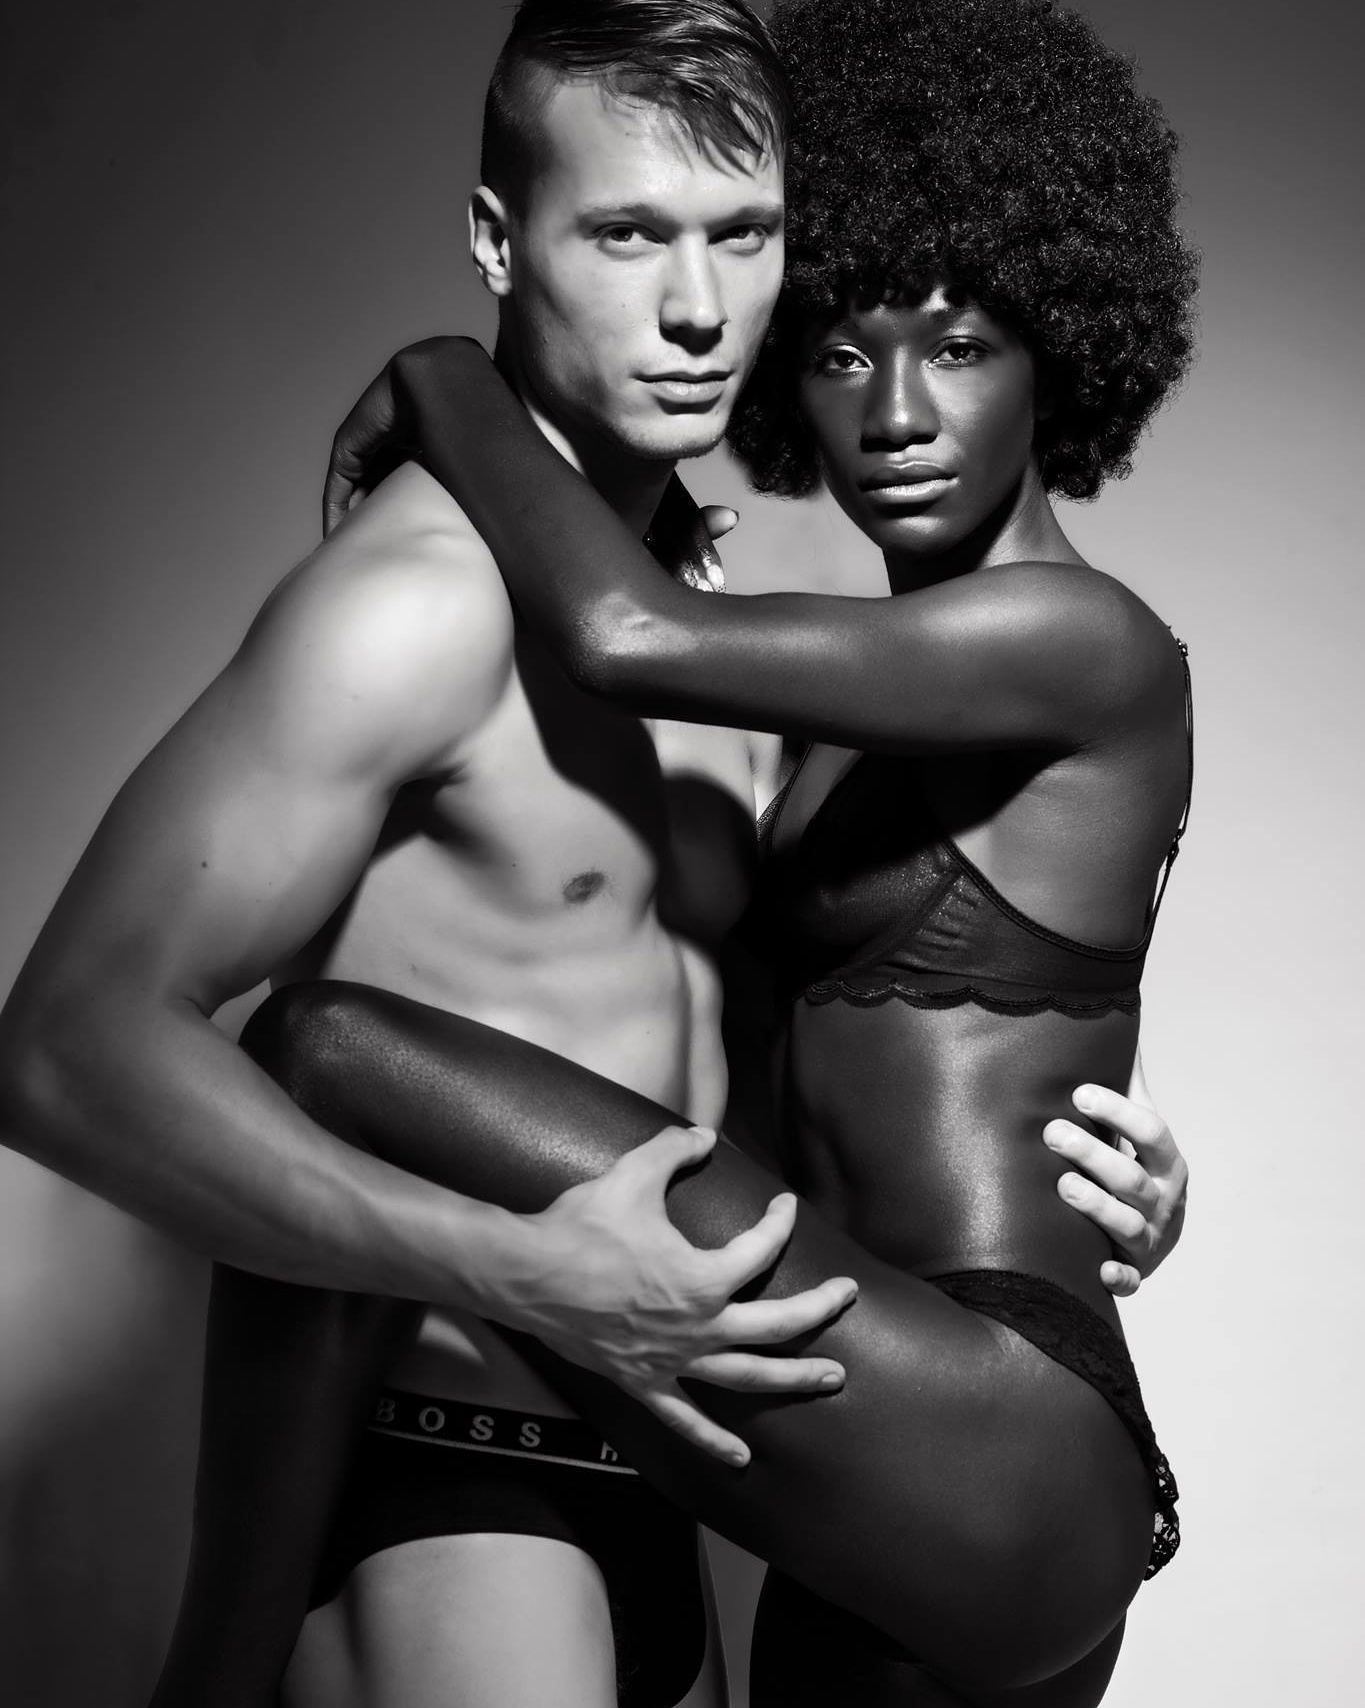 Interracial Love shot by Steph Dray